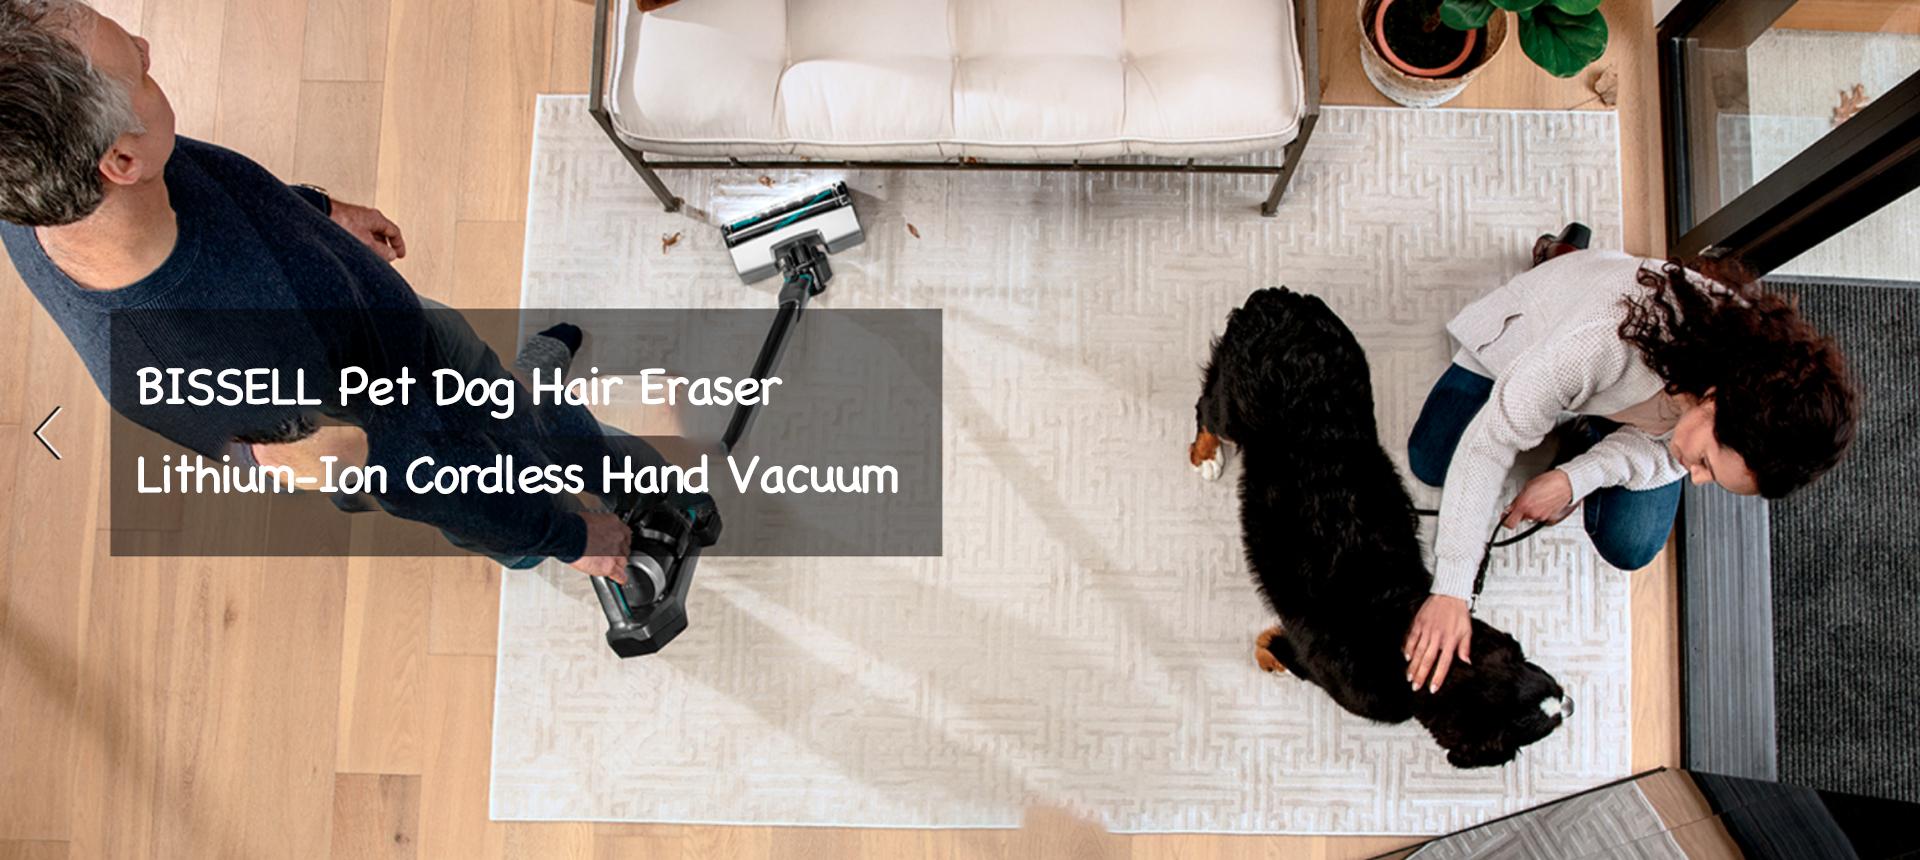 BISSELL Pet Dog Hair Eraser Lithium-Ion Cordless Hand Vacuum